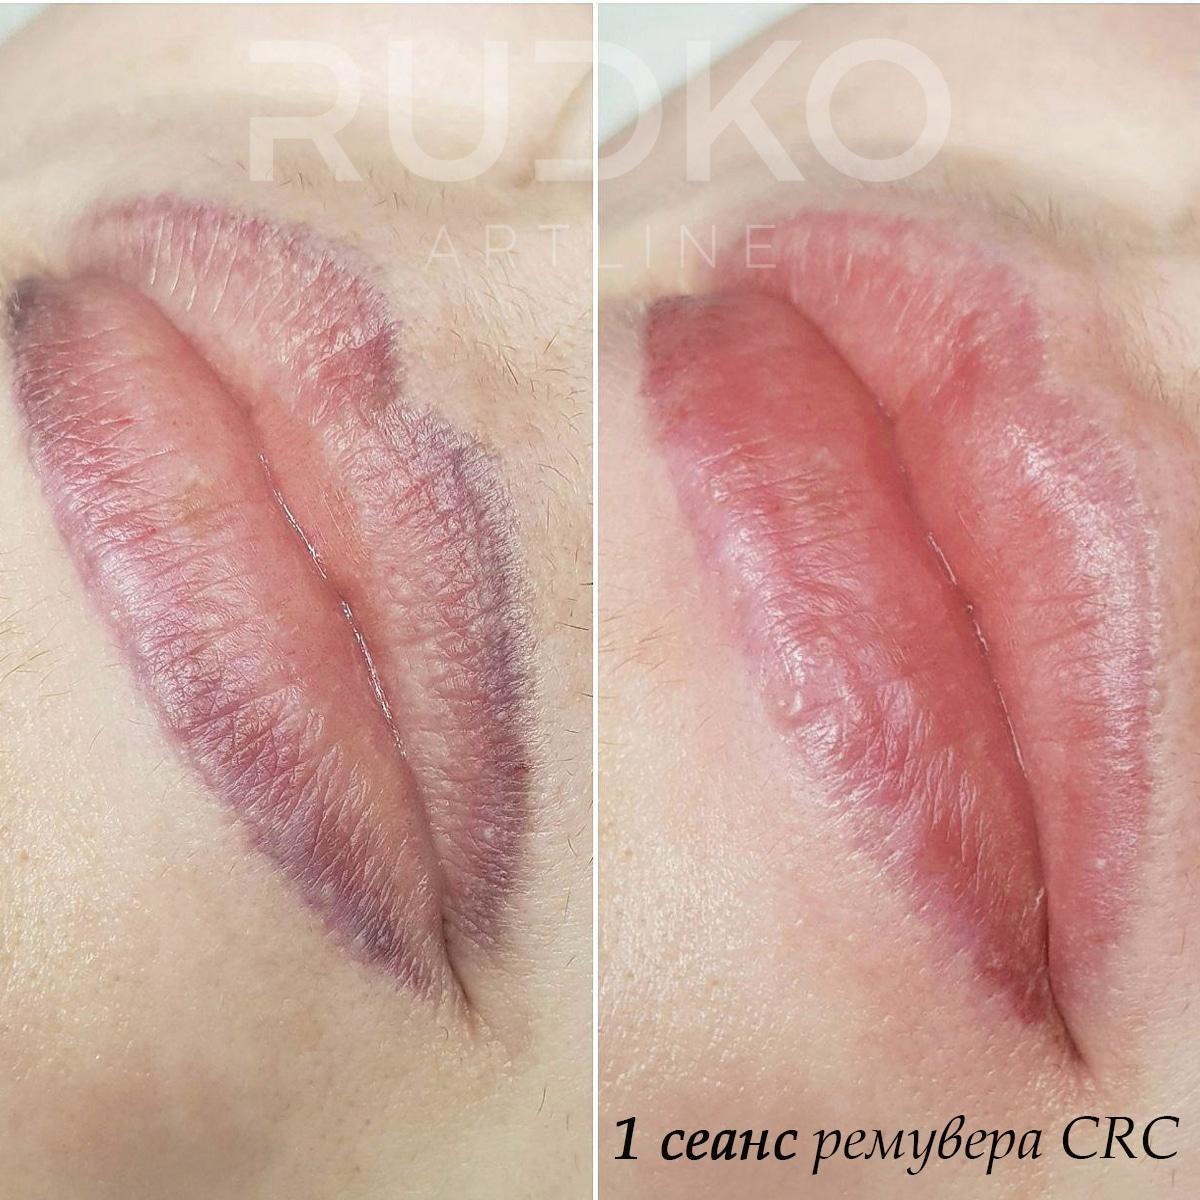 удалить татуаж губ киев быстро